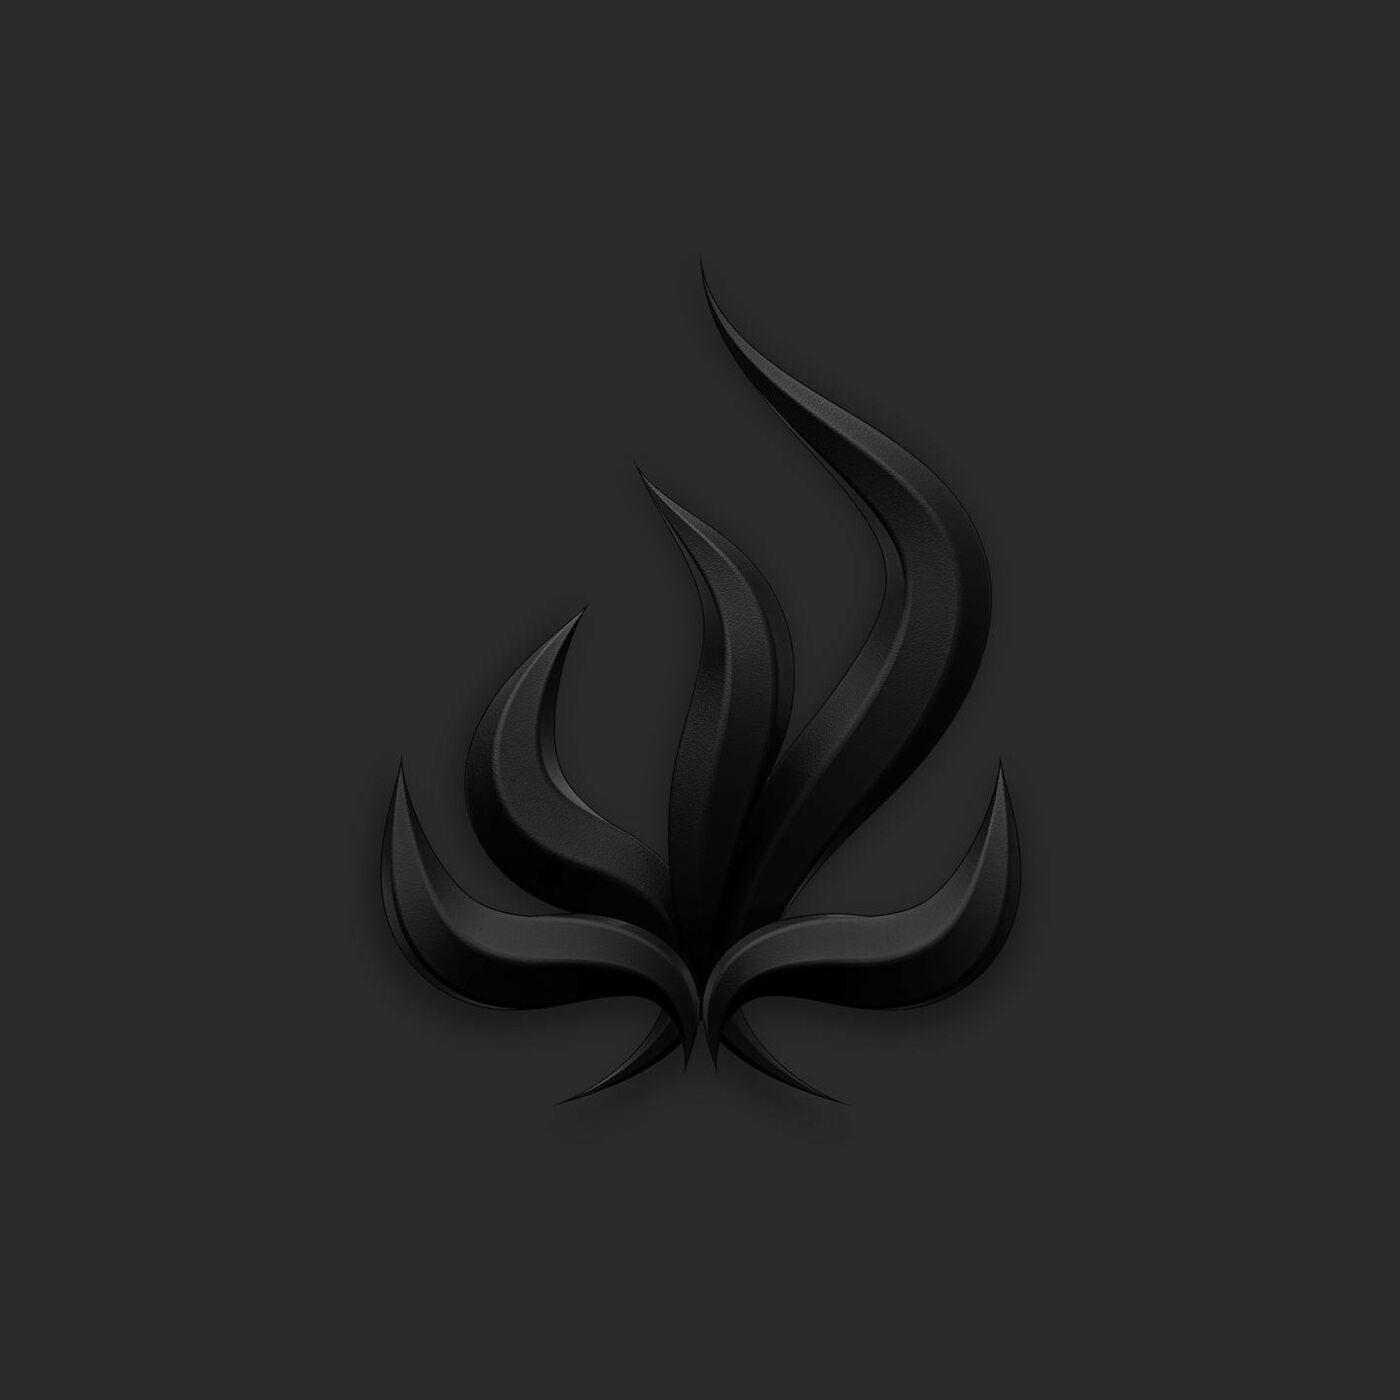 Bury Tomorrow - Black Flame (2018)